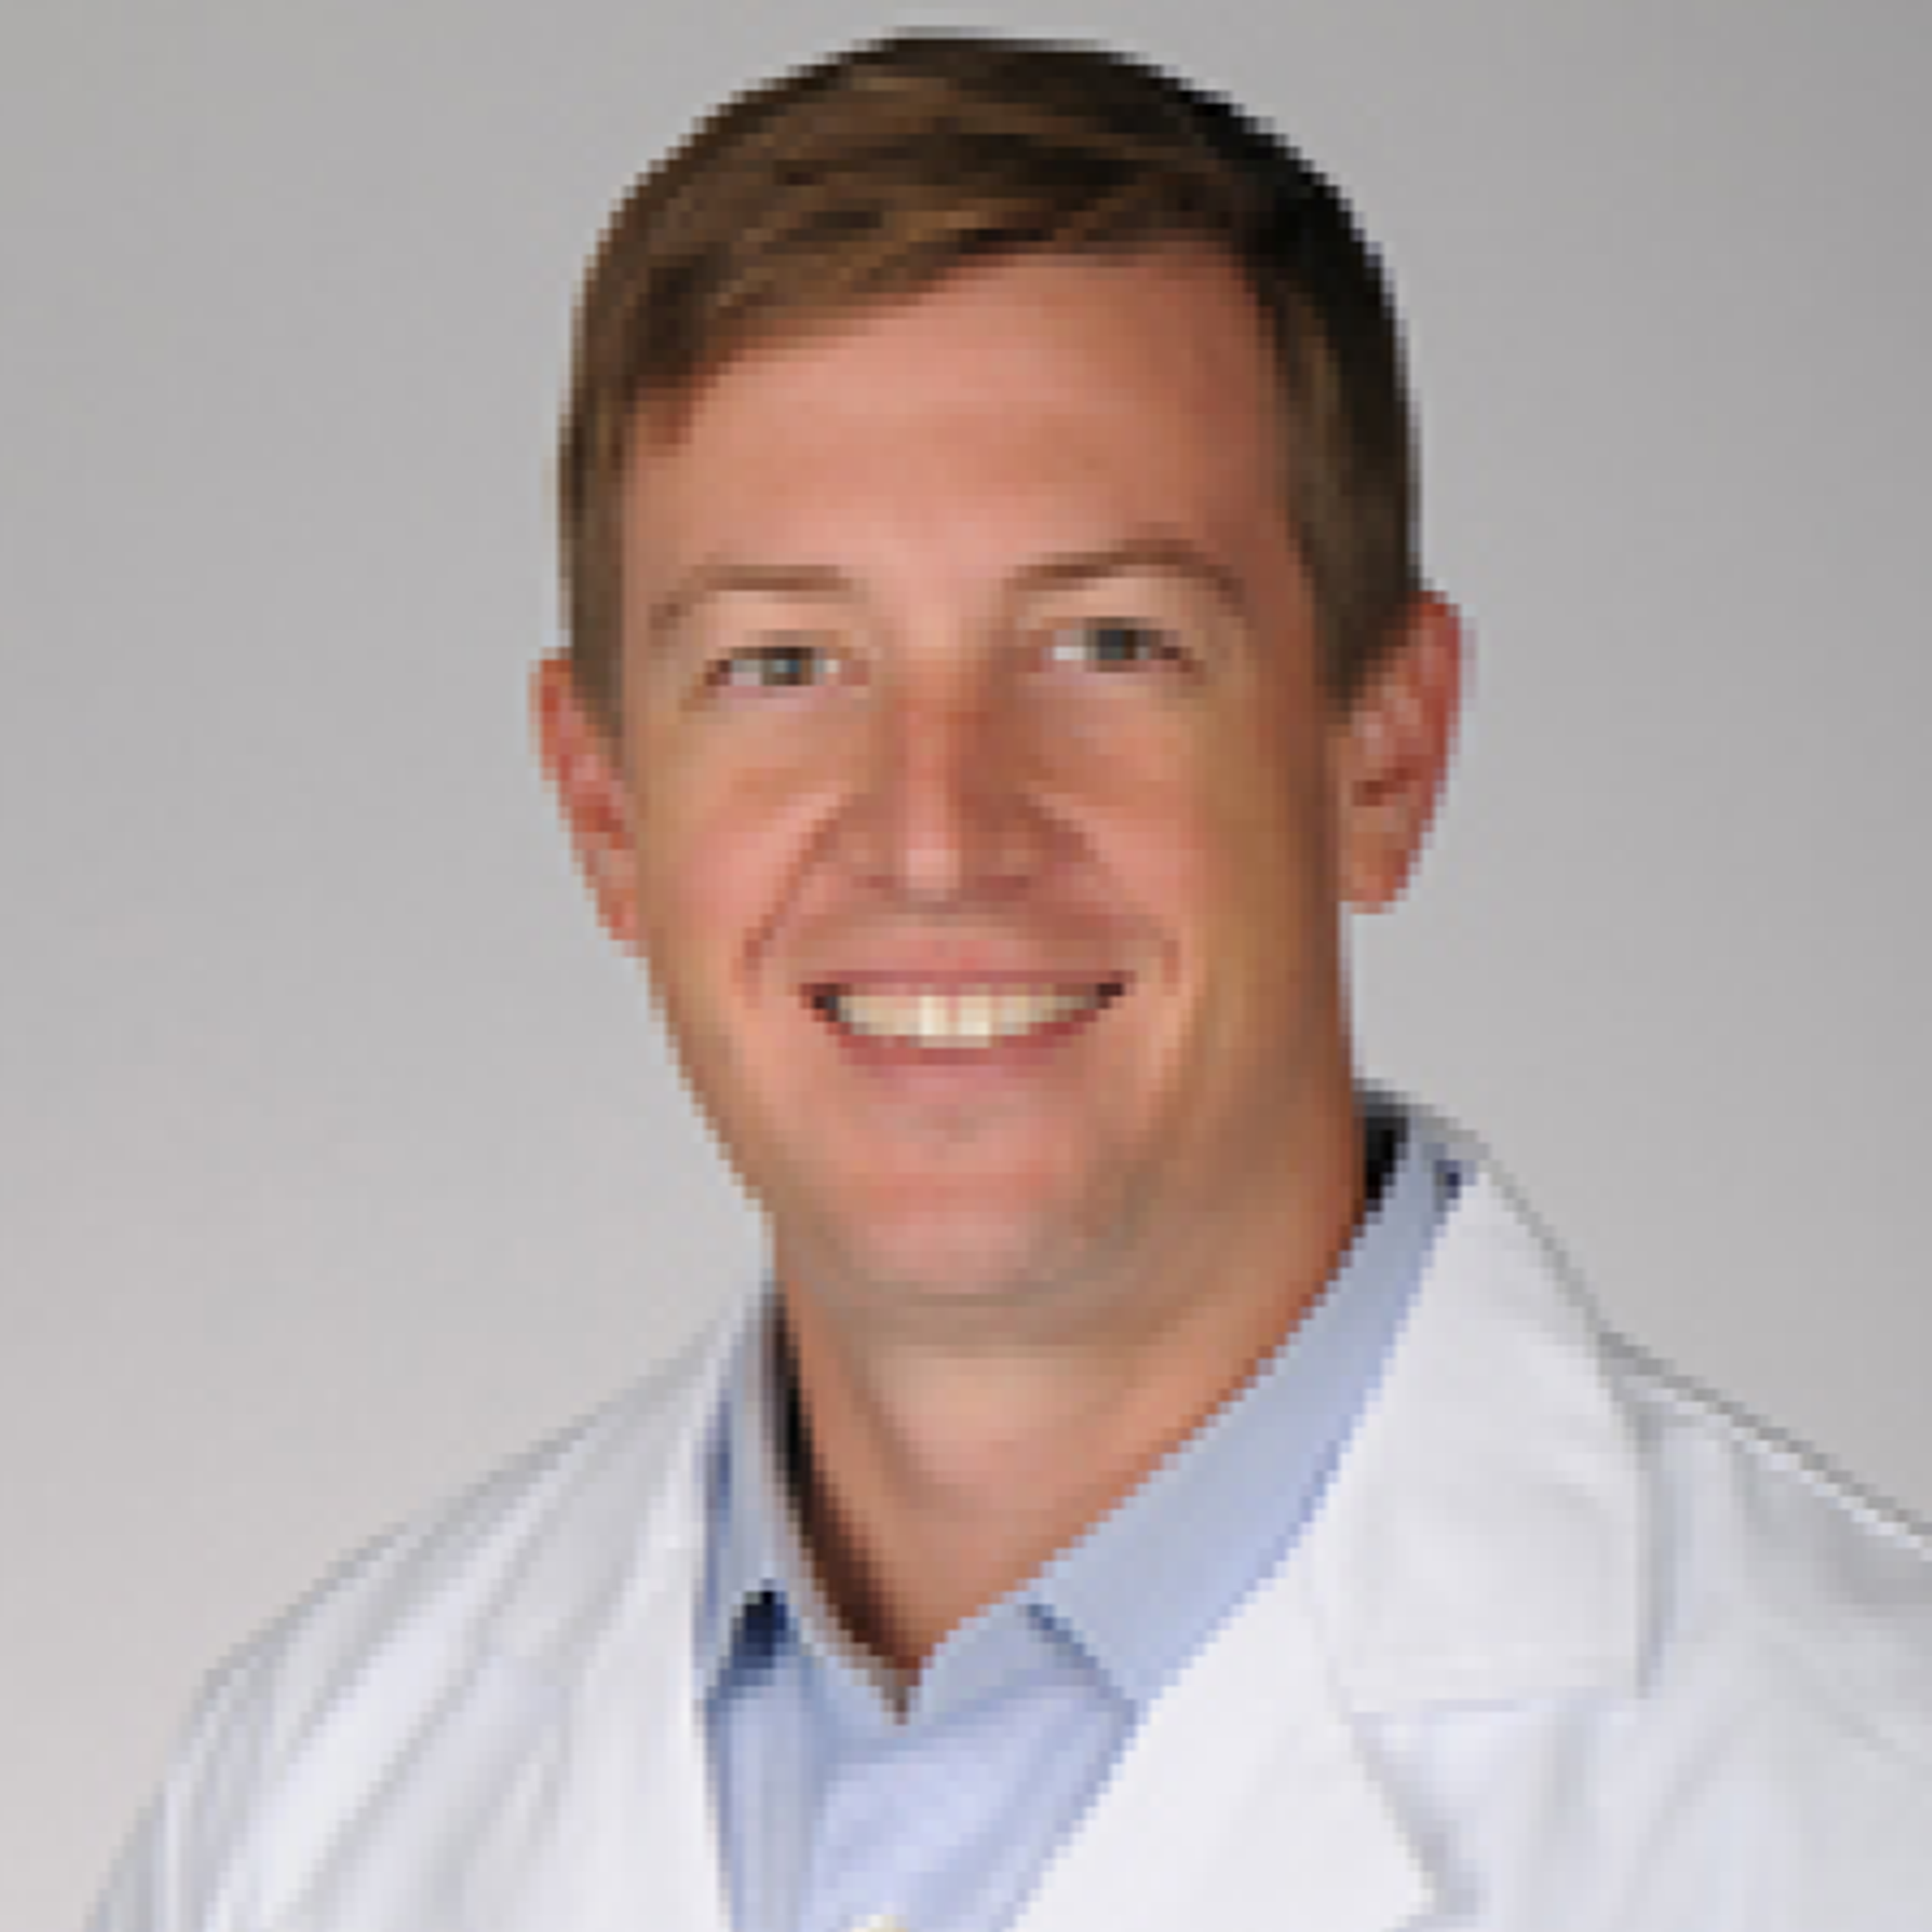 Dr. Brockman D Smith